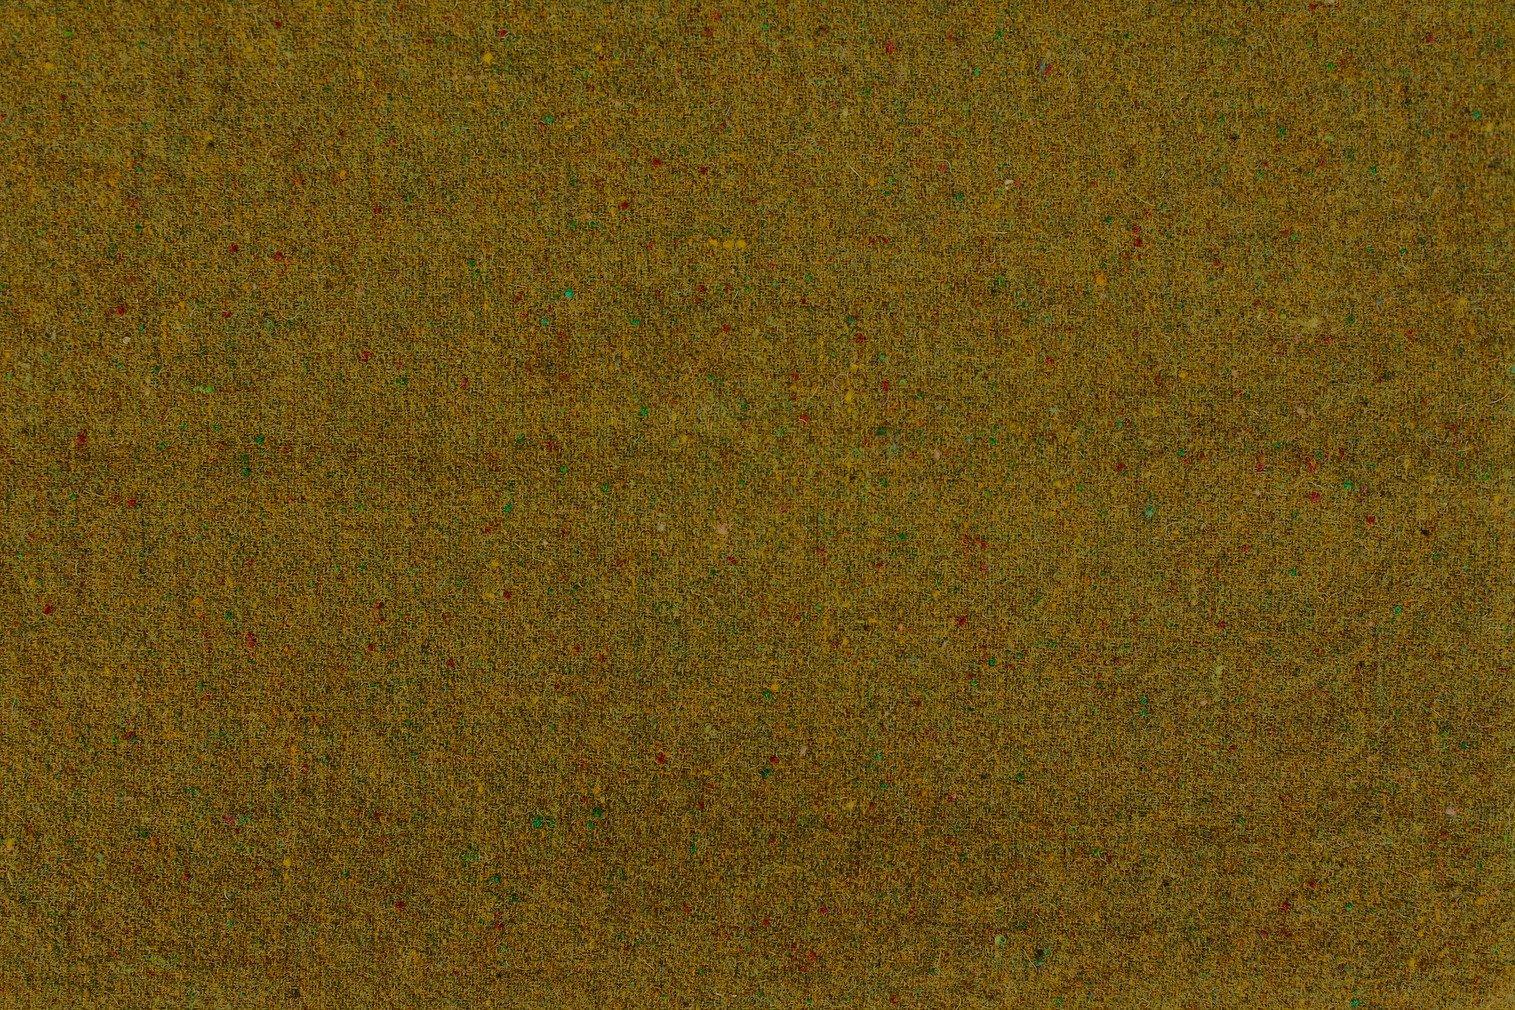 Pond Green 9 X 14 100% Wool